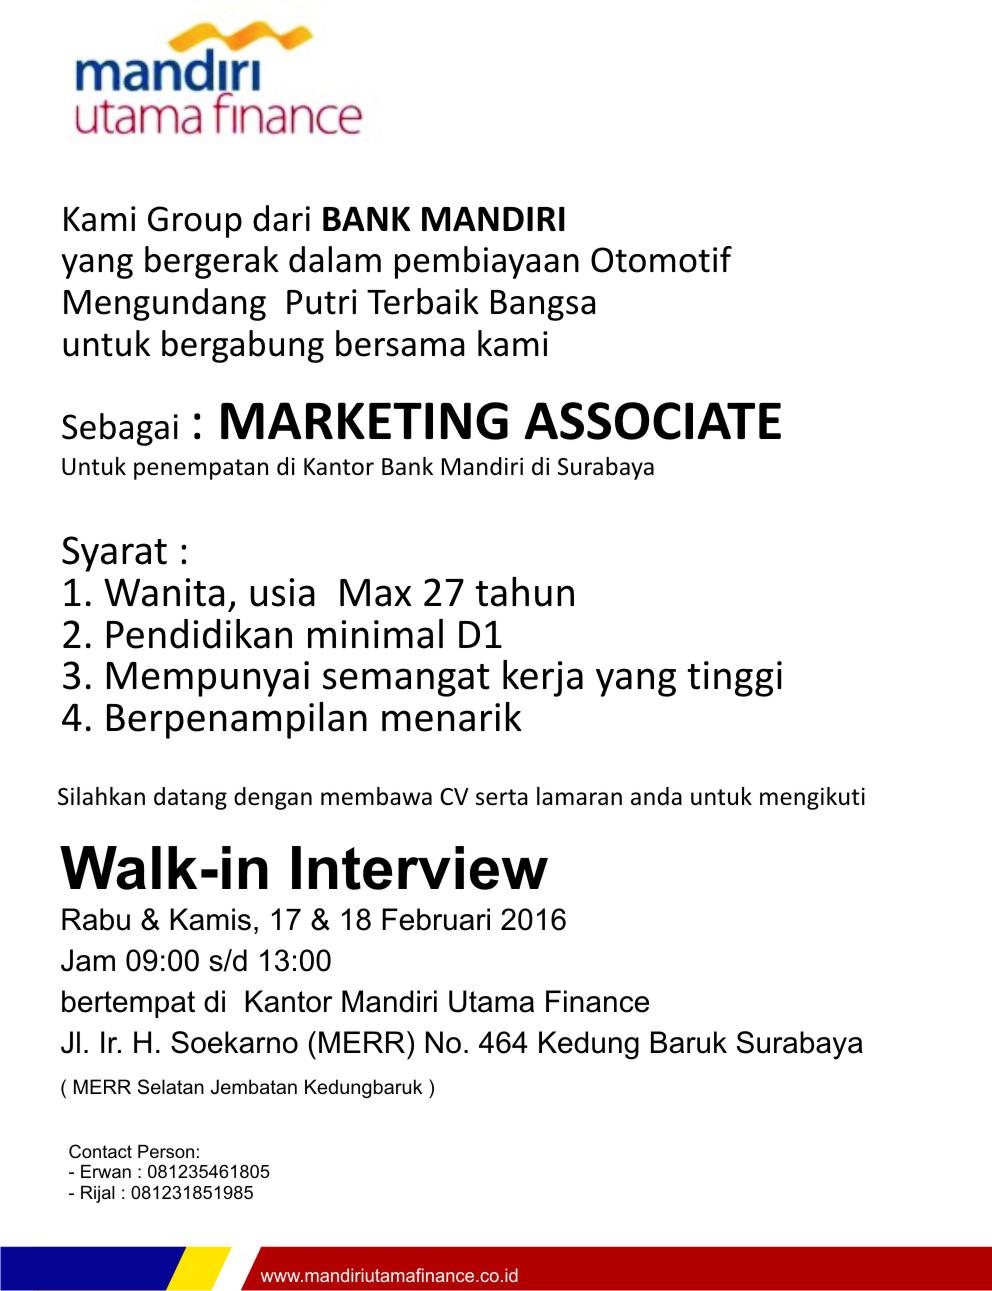 walk in interview di mandiri utama finance surabaya